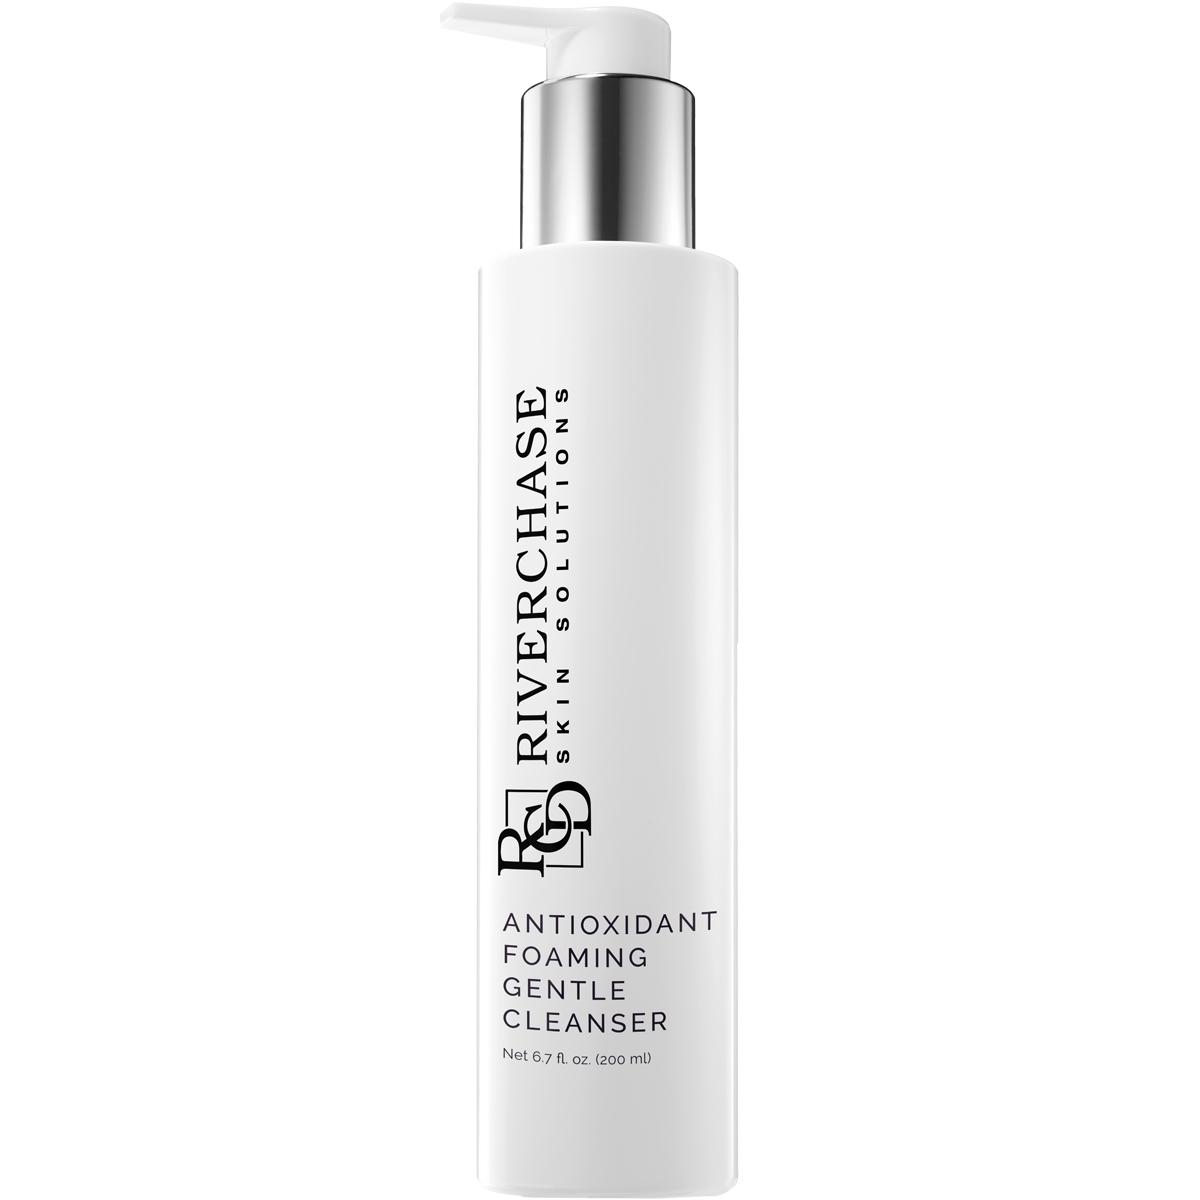 Antioxidant Foaming Gentle Cleanser